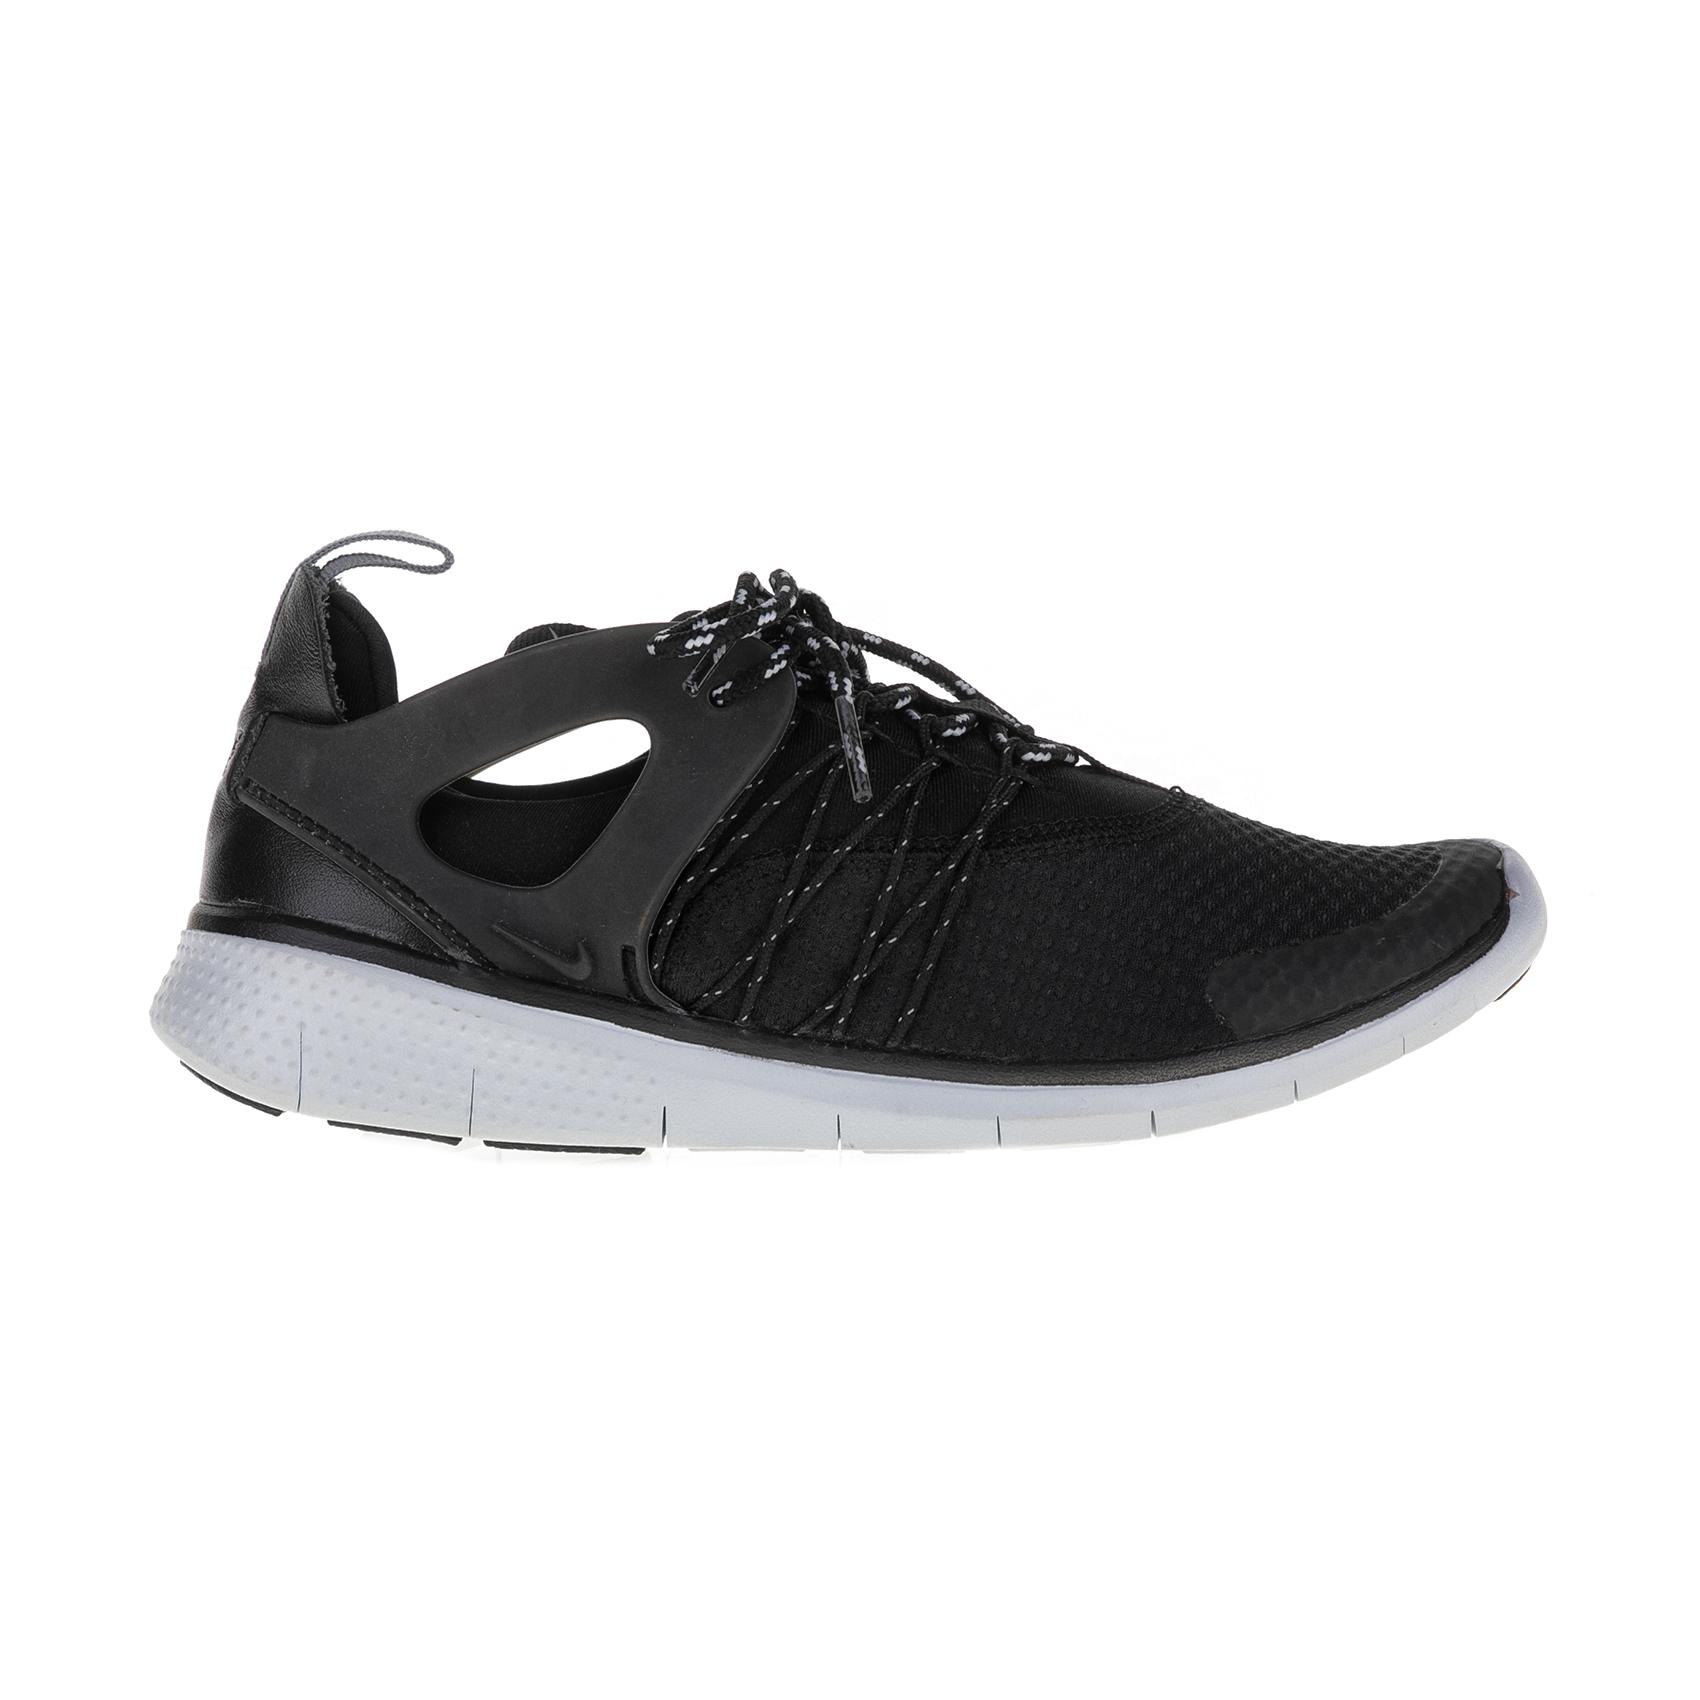 NIKE – Γυναικεία αθλητικά παπούτσια Nike FREE VIRITOUS μαύρα